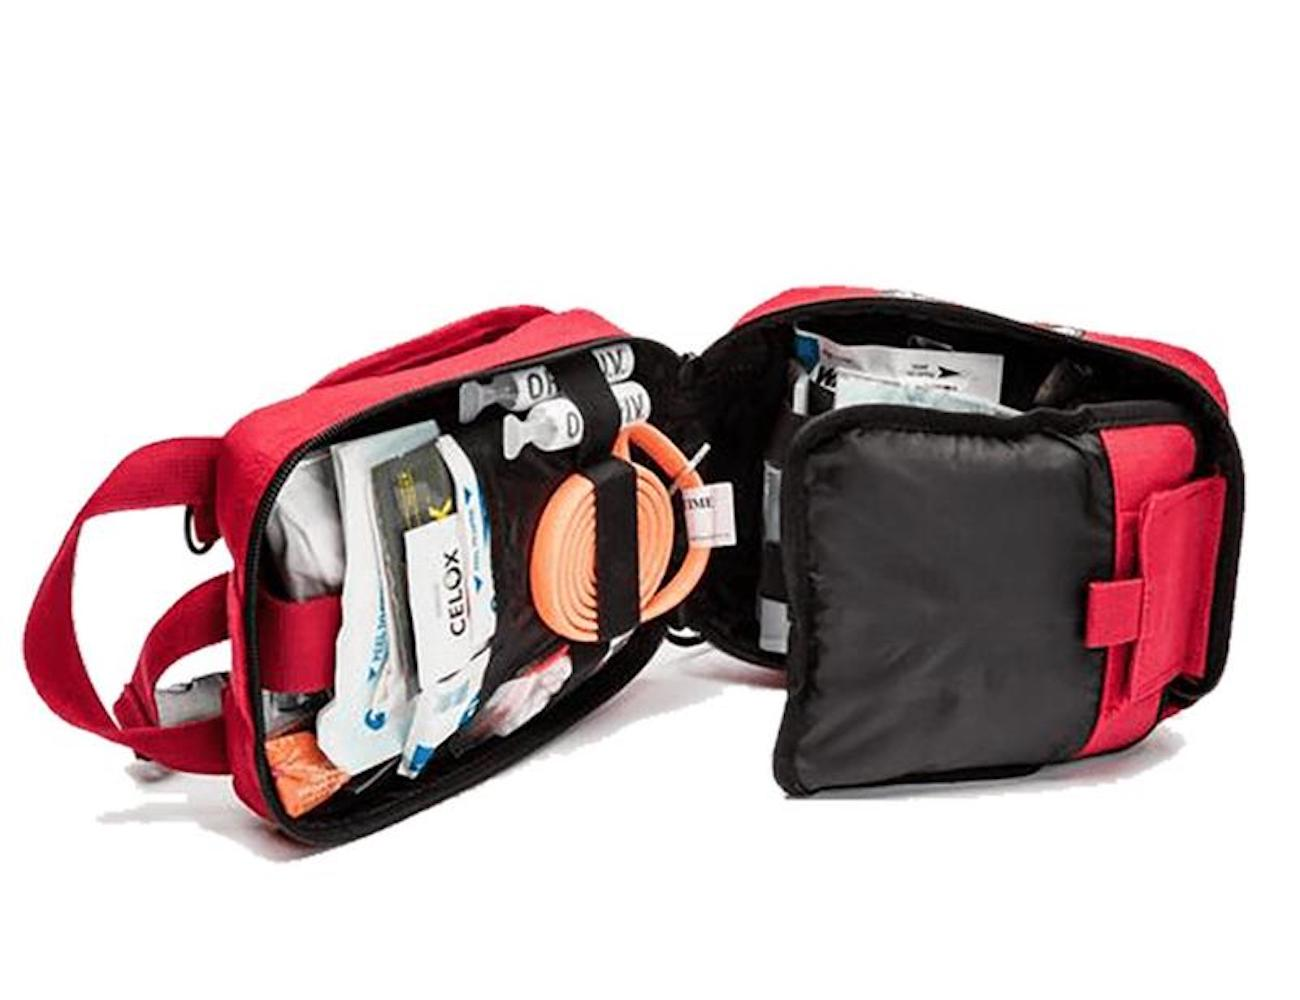 MyFAK Rugged First Aid Kit